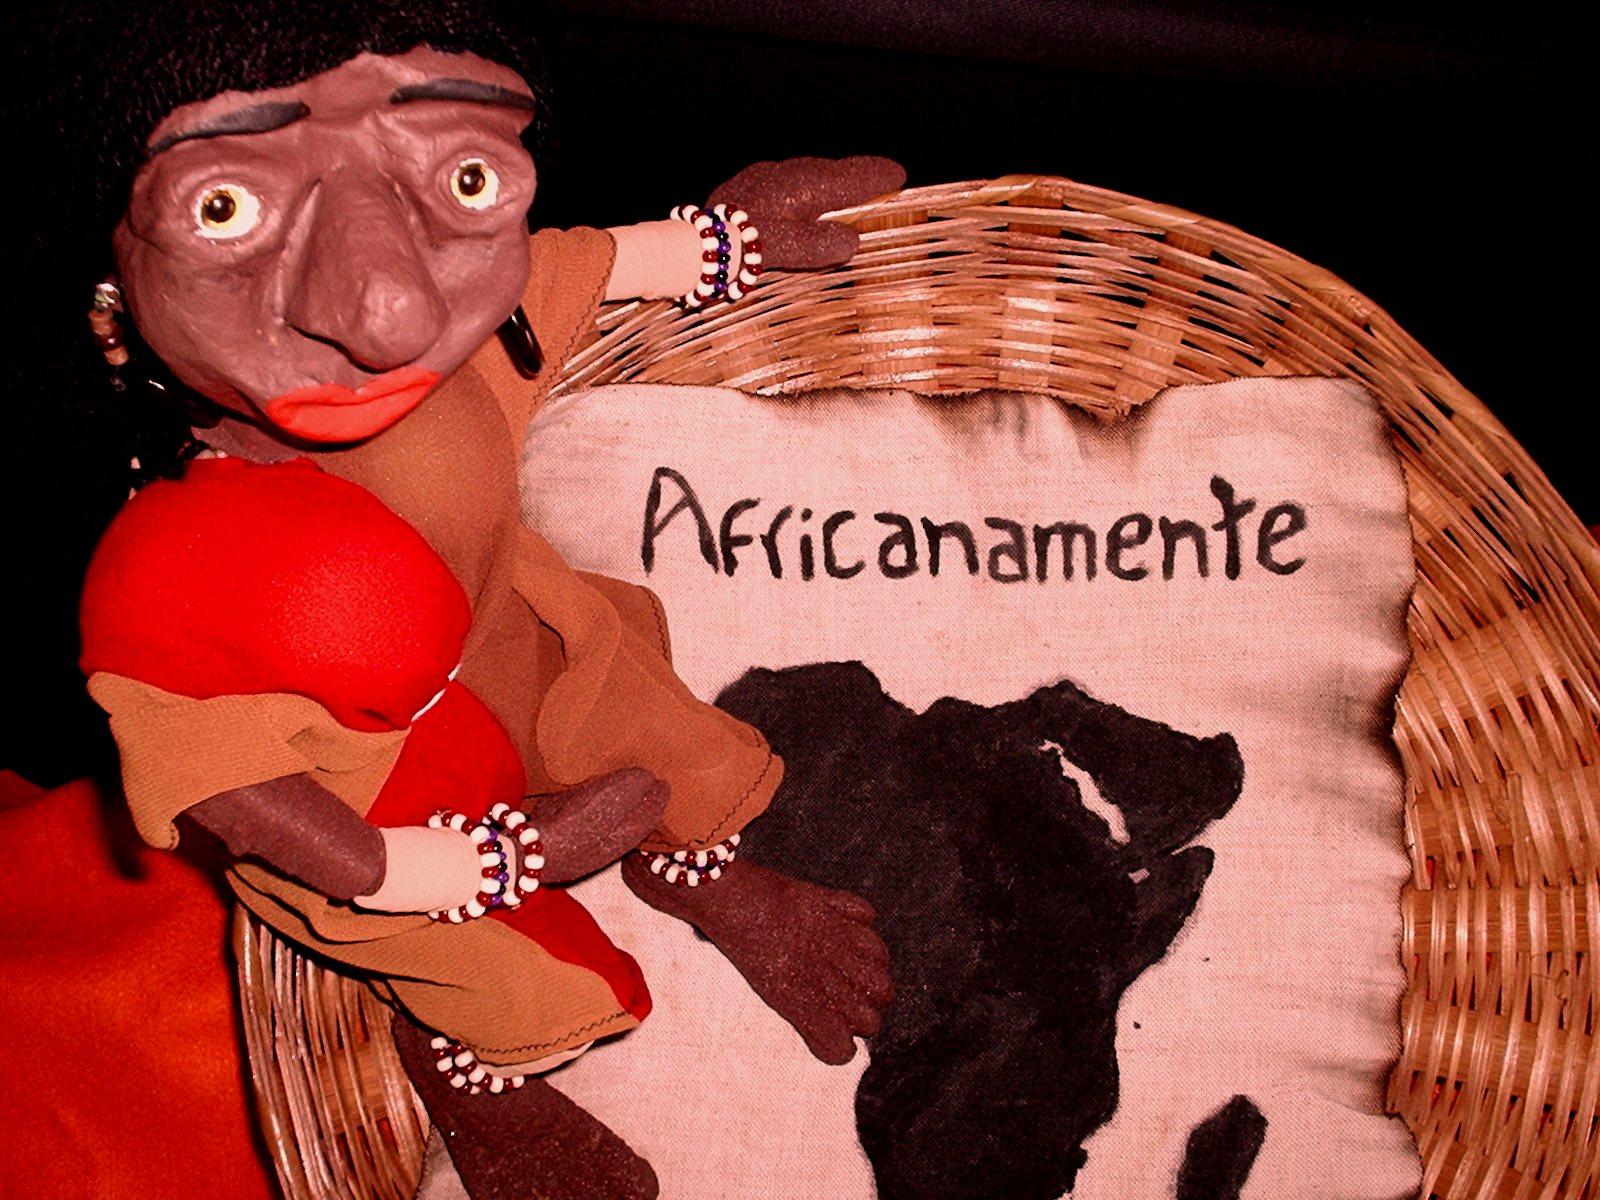 Africanamente